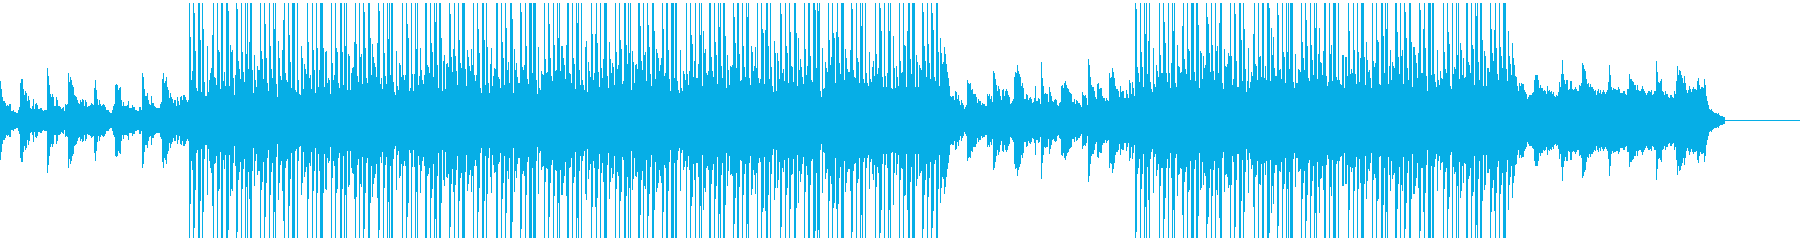 R&B コーポレート レトロ アク...の再生済みの波形